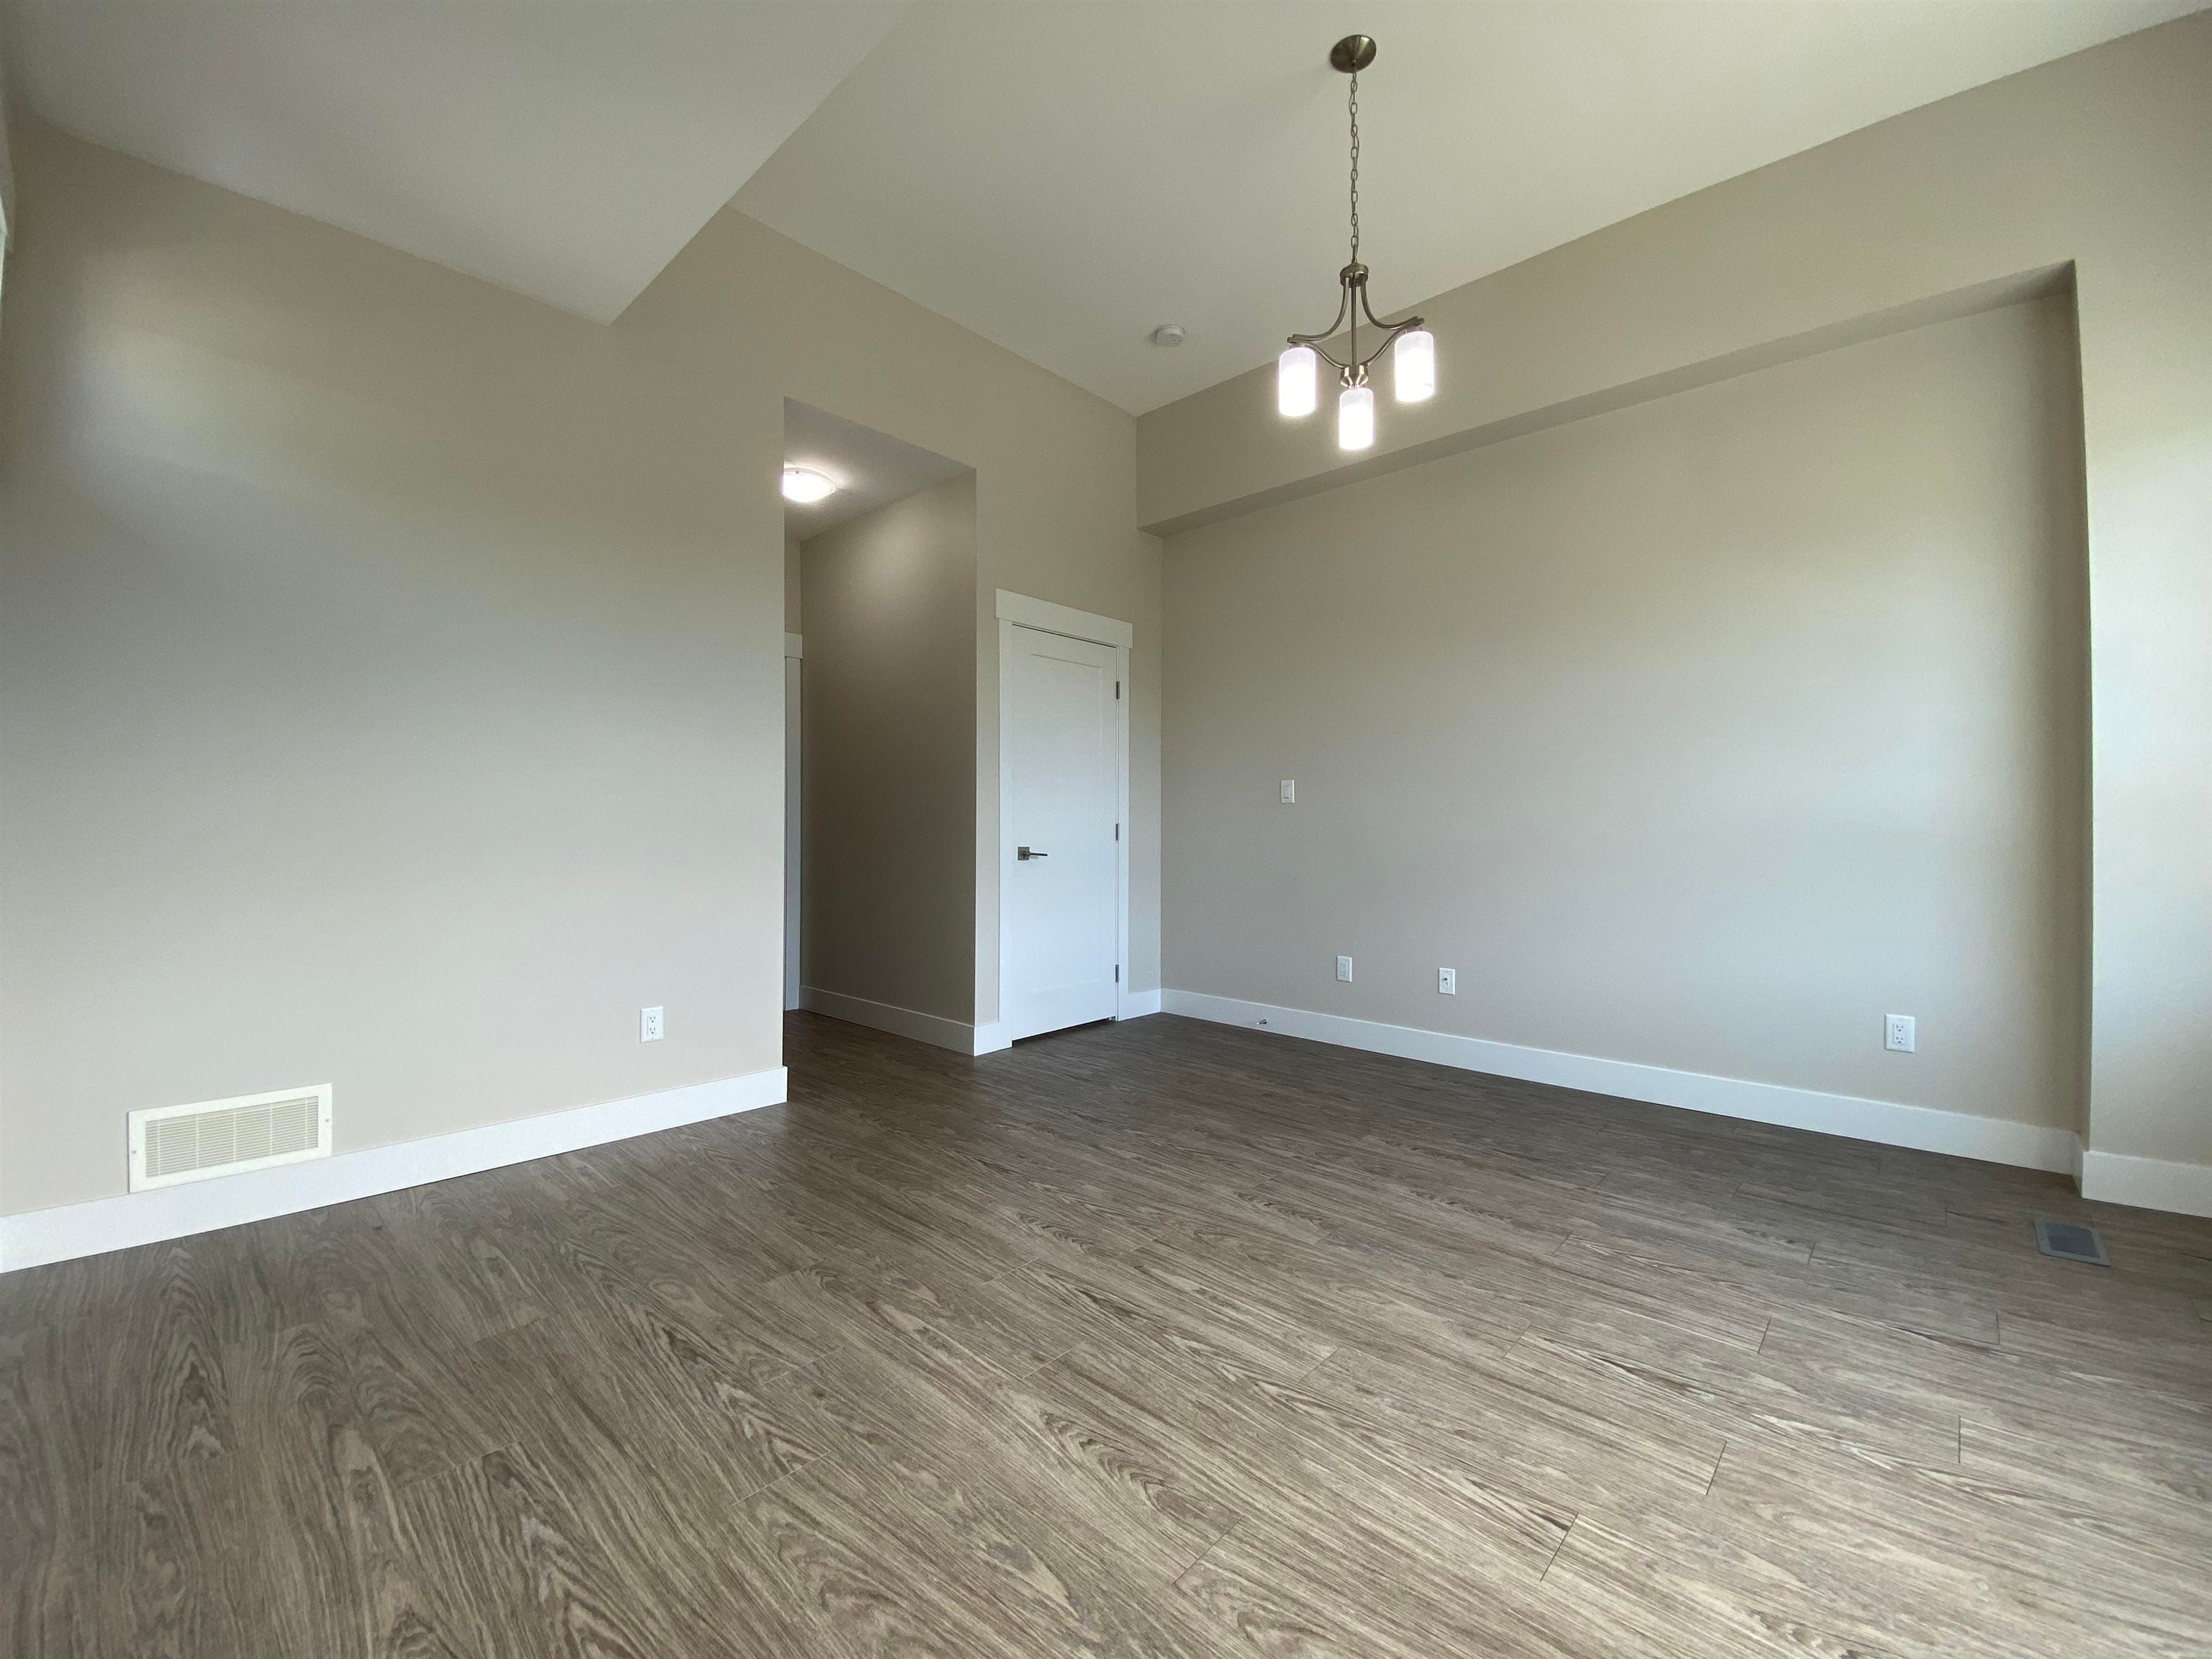 10144 KILLARNEY DRIVE - Fairfield Island House/Single Family for sale, 5 Bedrooms (R2625716) - #24